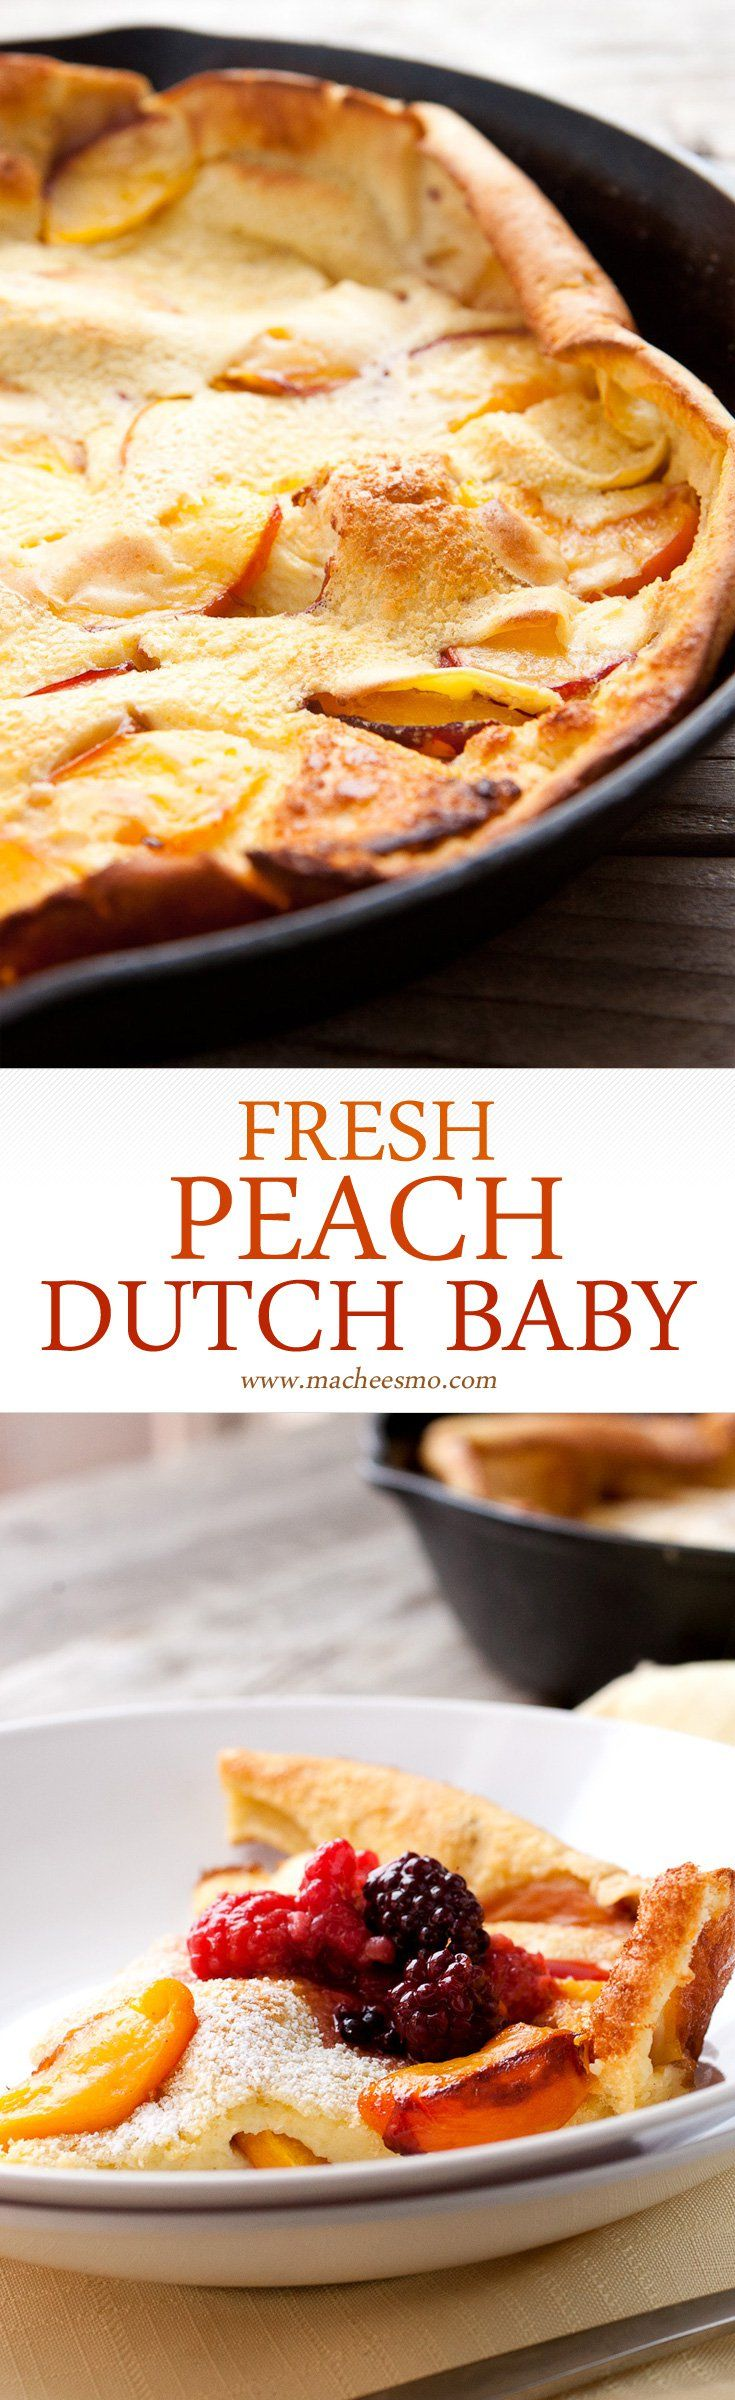 fresh peach dutch baby fresh peach dutch baby in season perfect ...